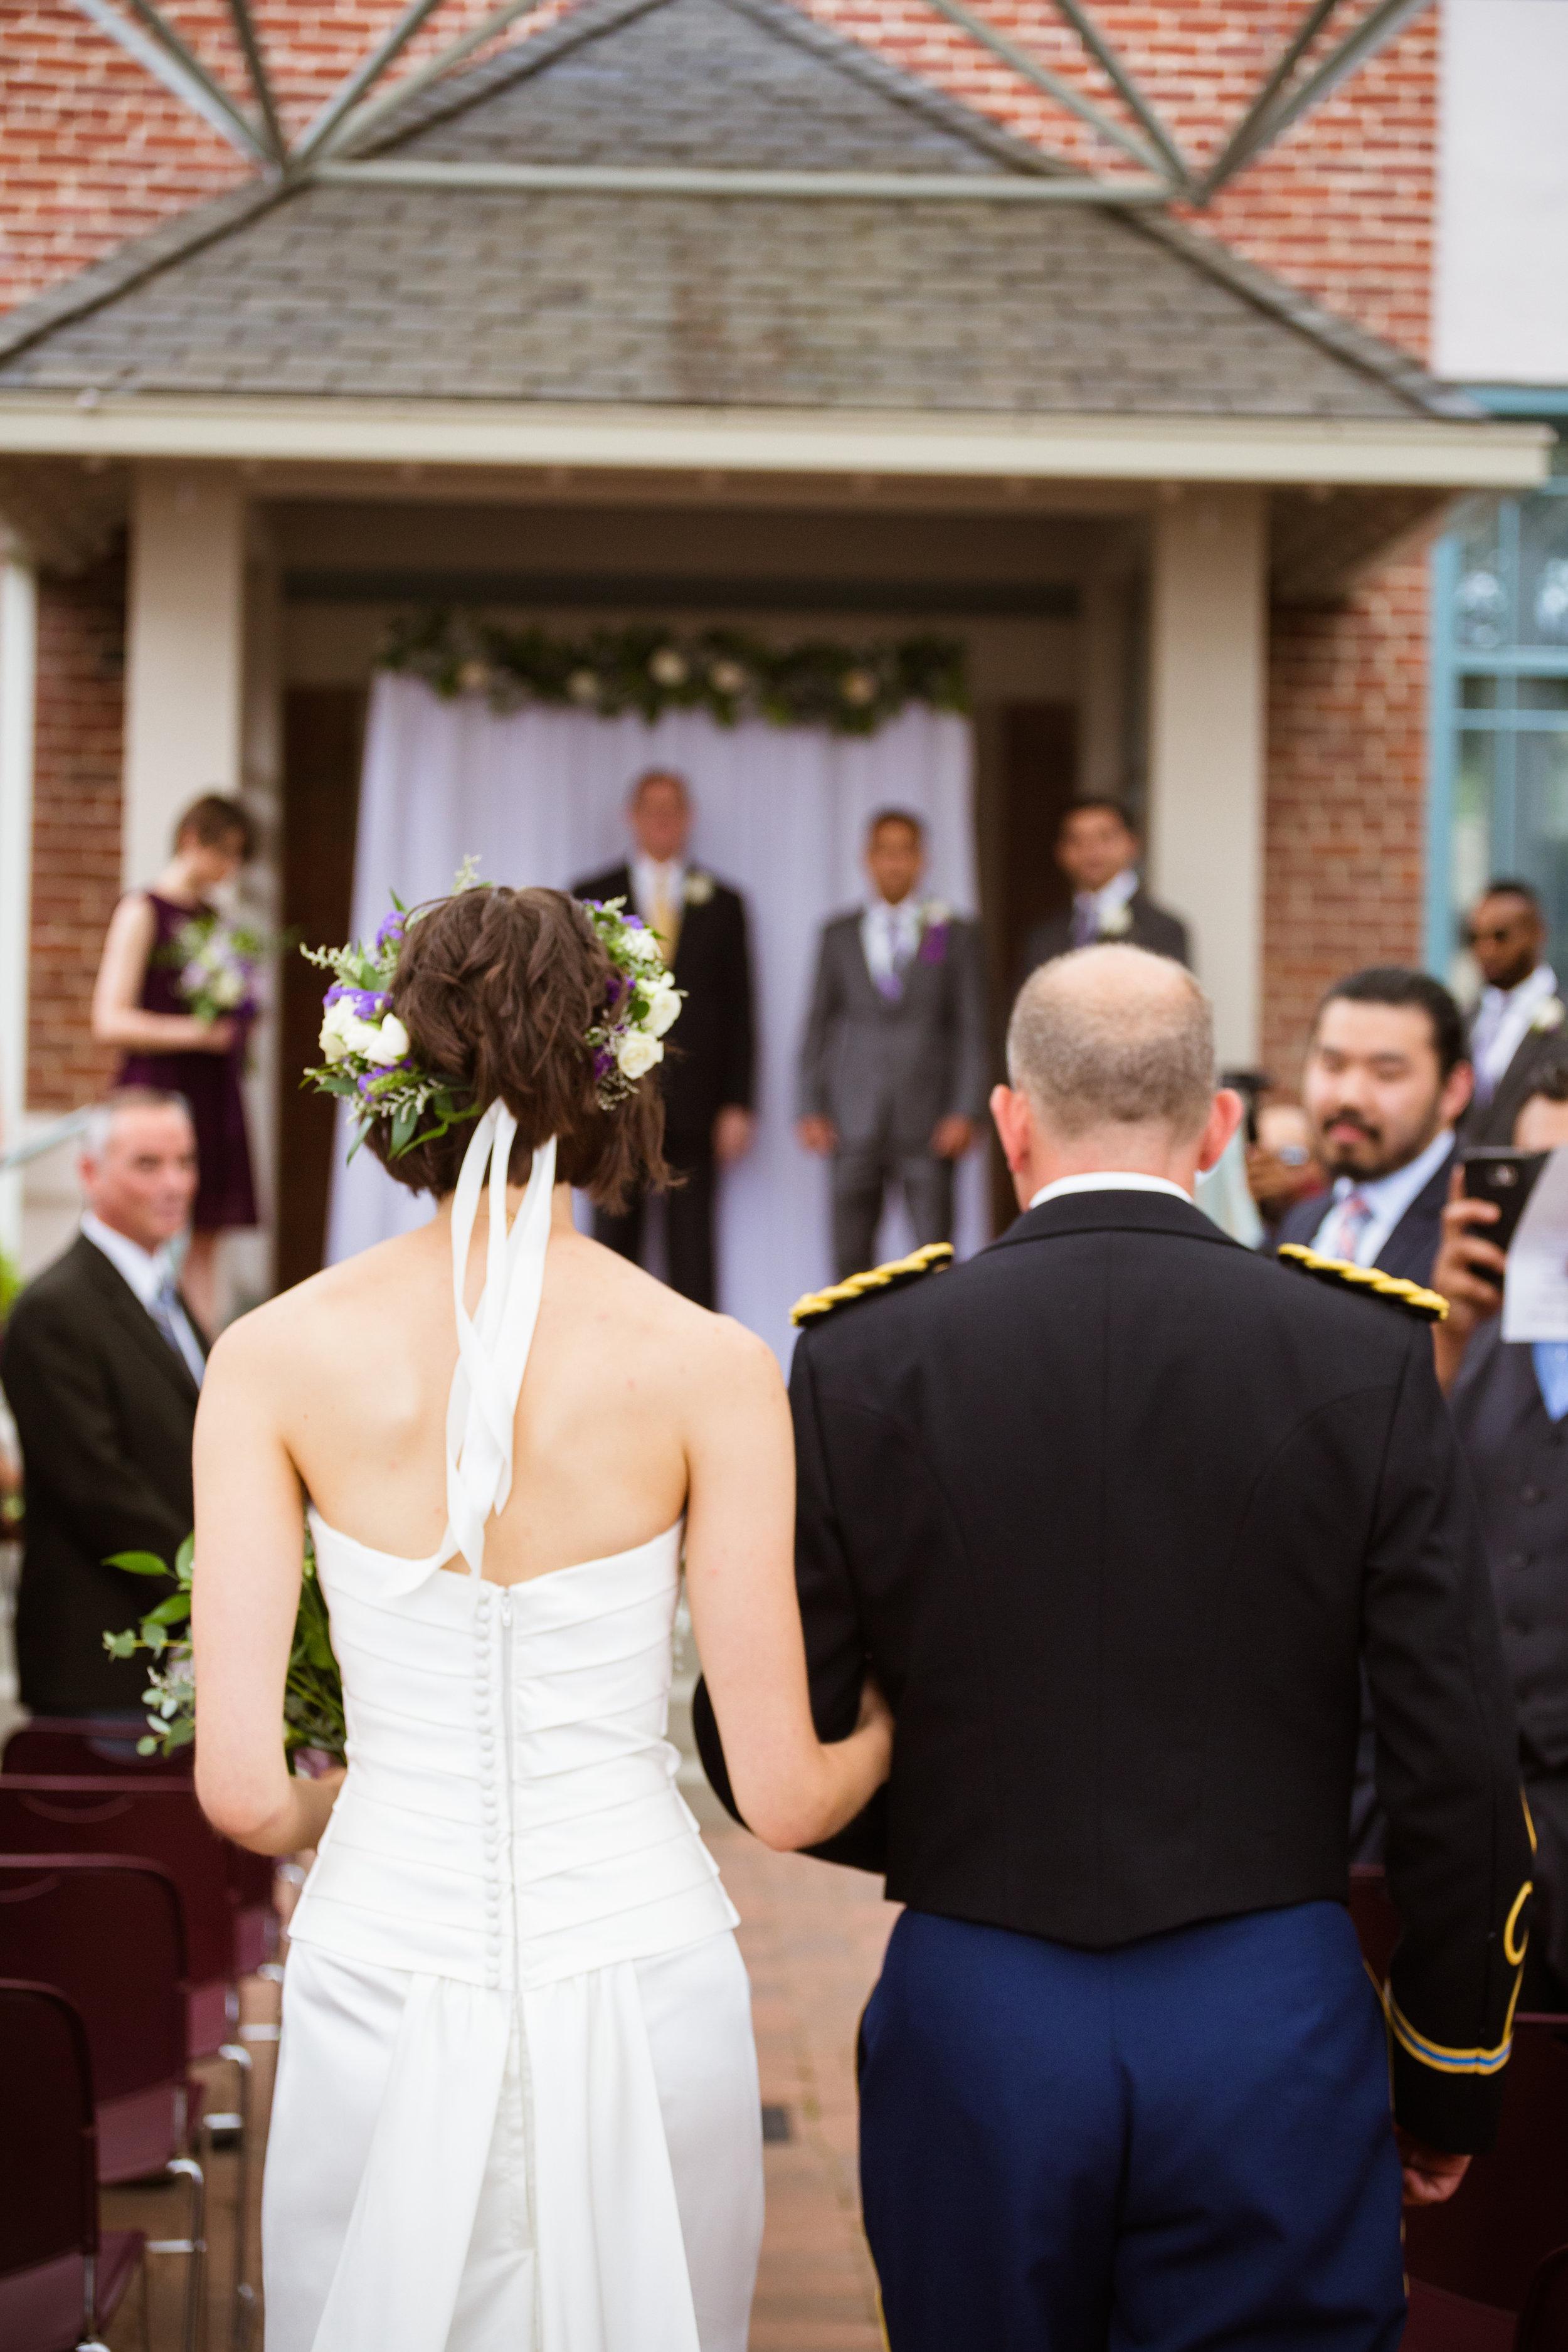 Blacano Wedding - Ceremony-20.jpg